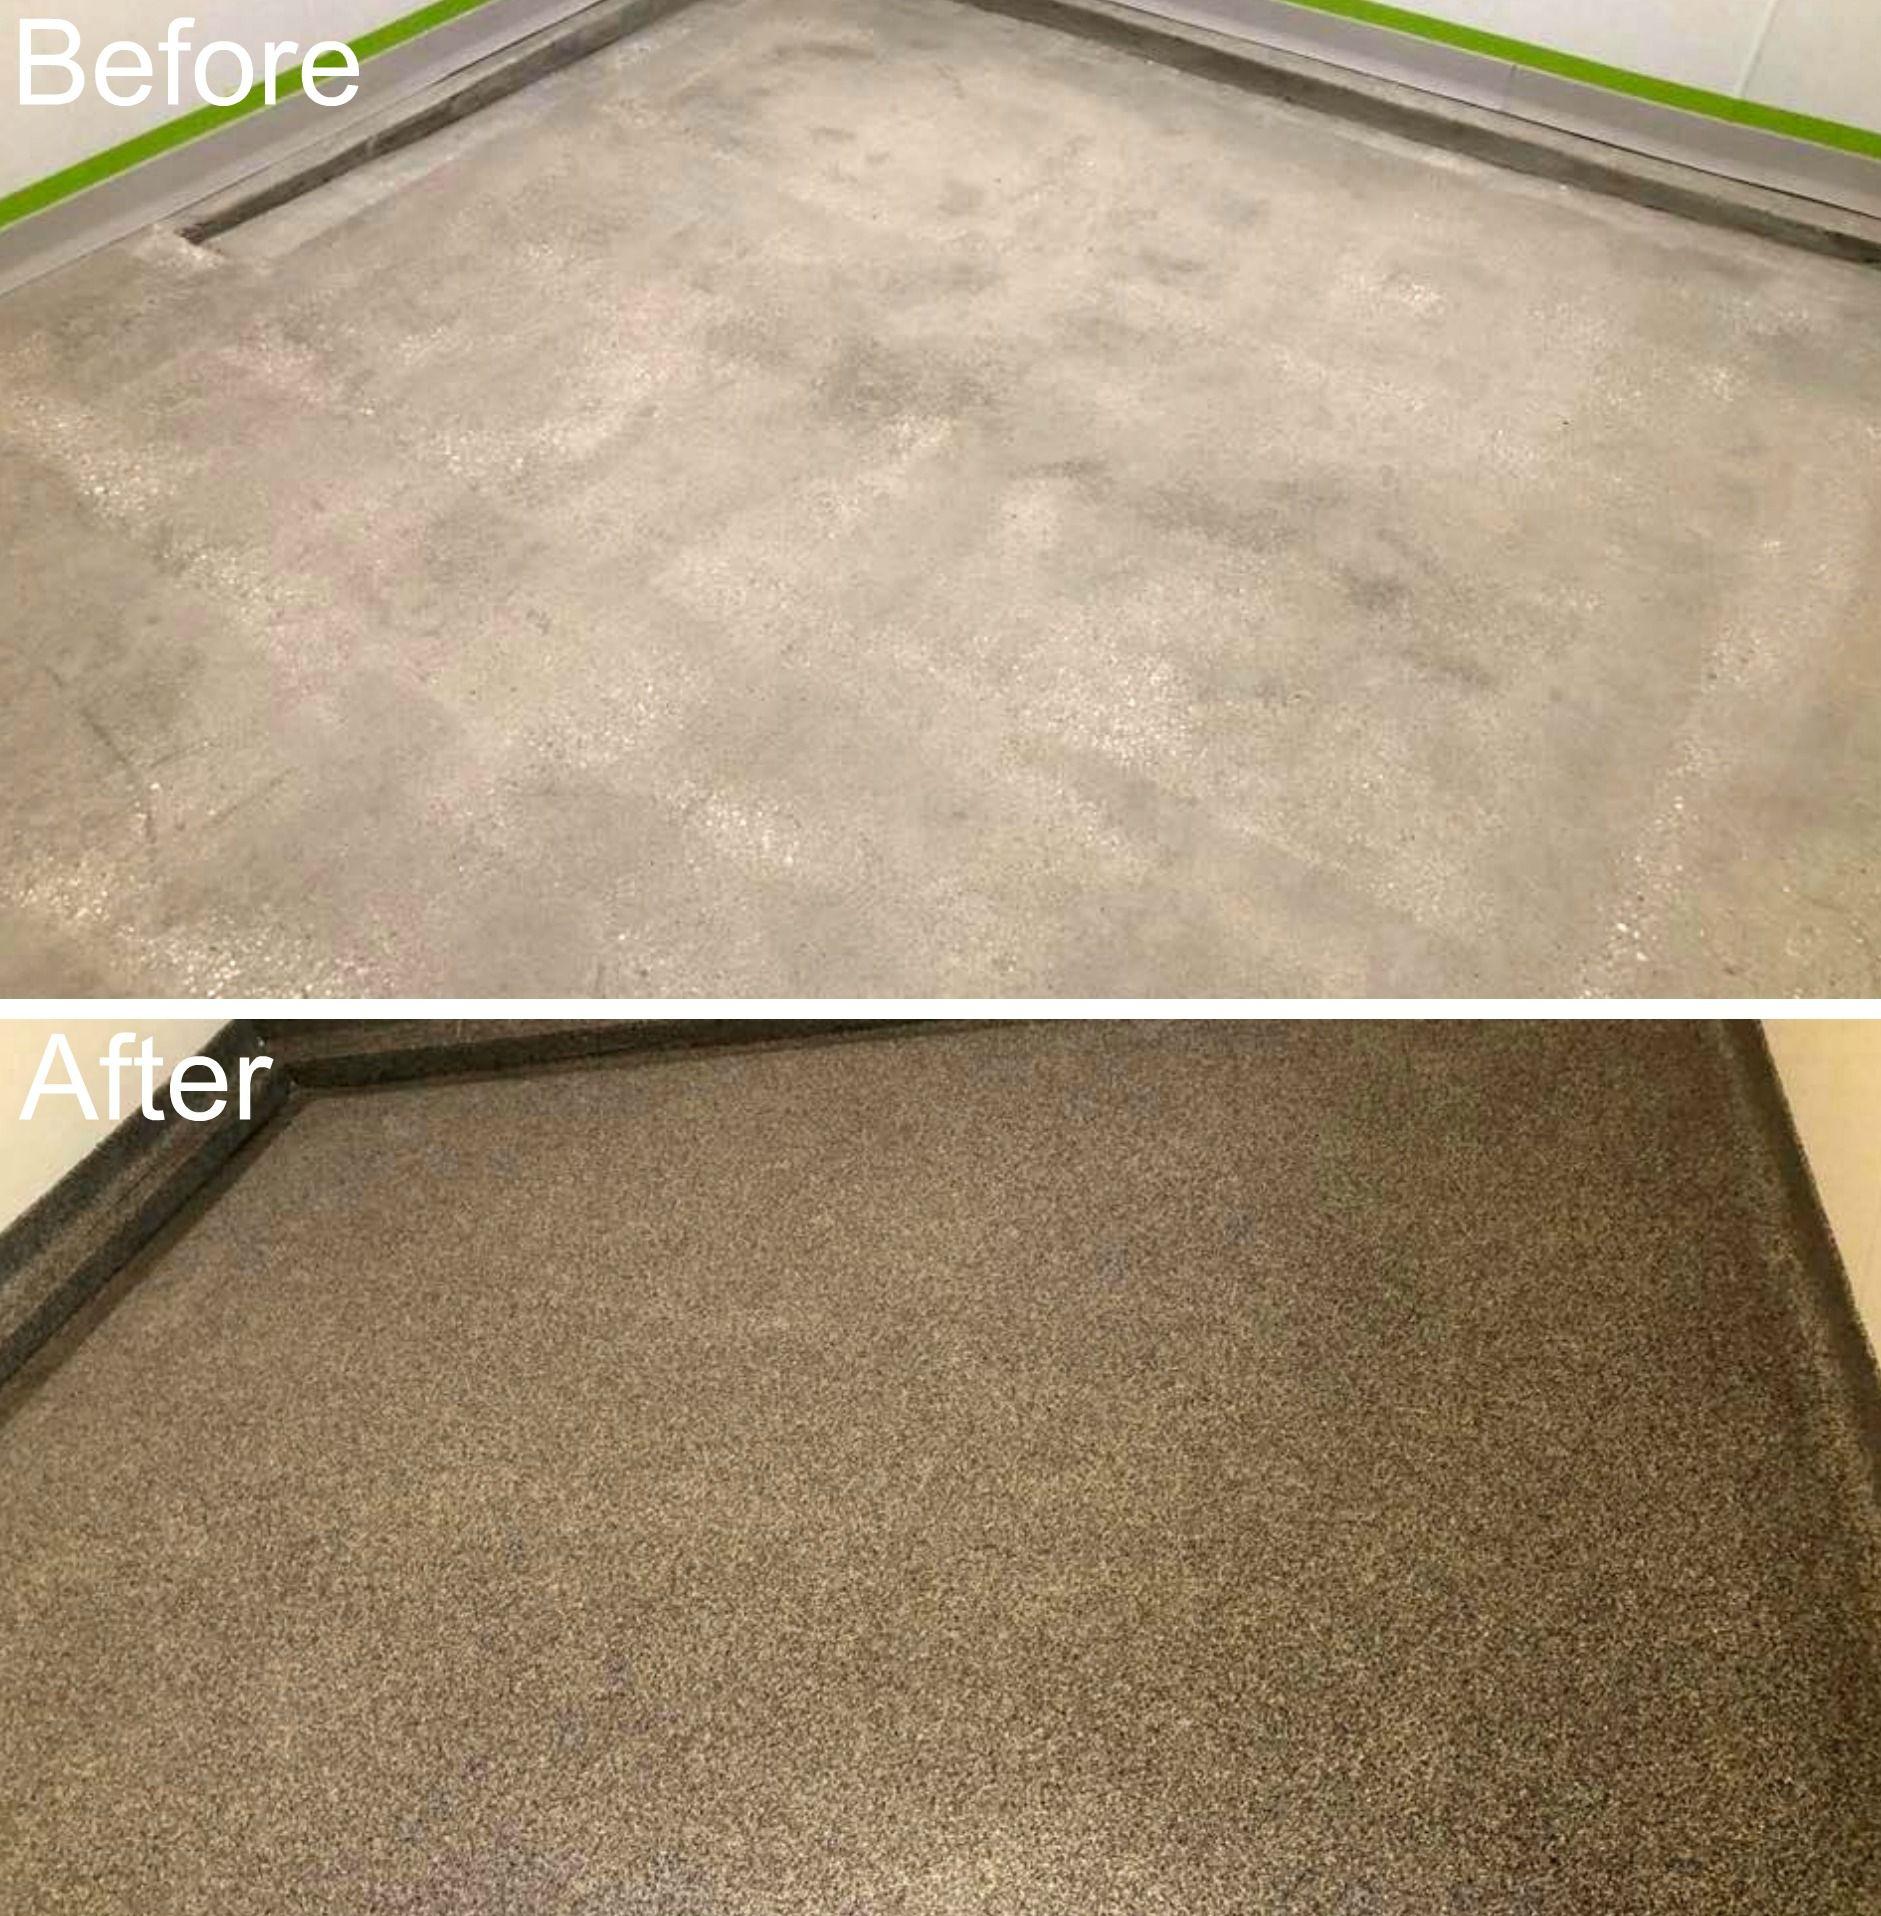 Graniflex Garage Floor Transformation In 2020 Concrete Decor Epoxy Floor India Home Decor